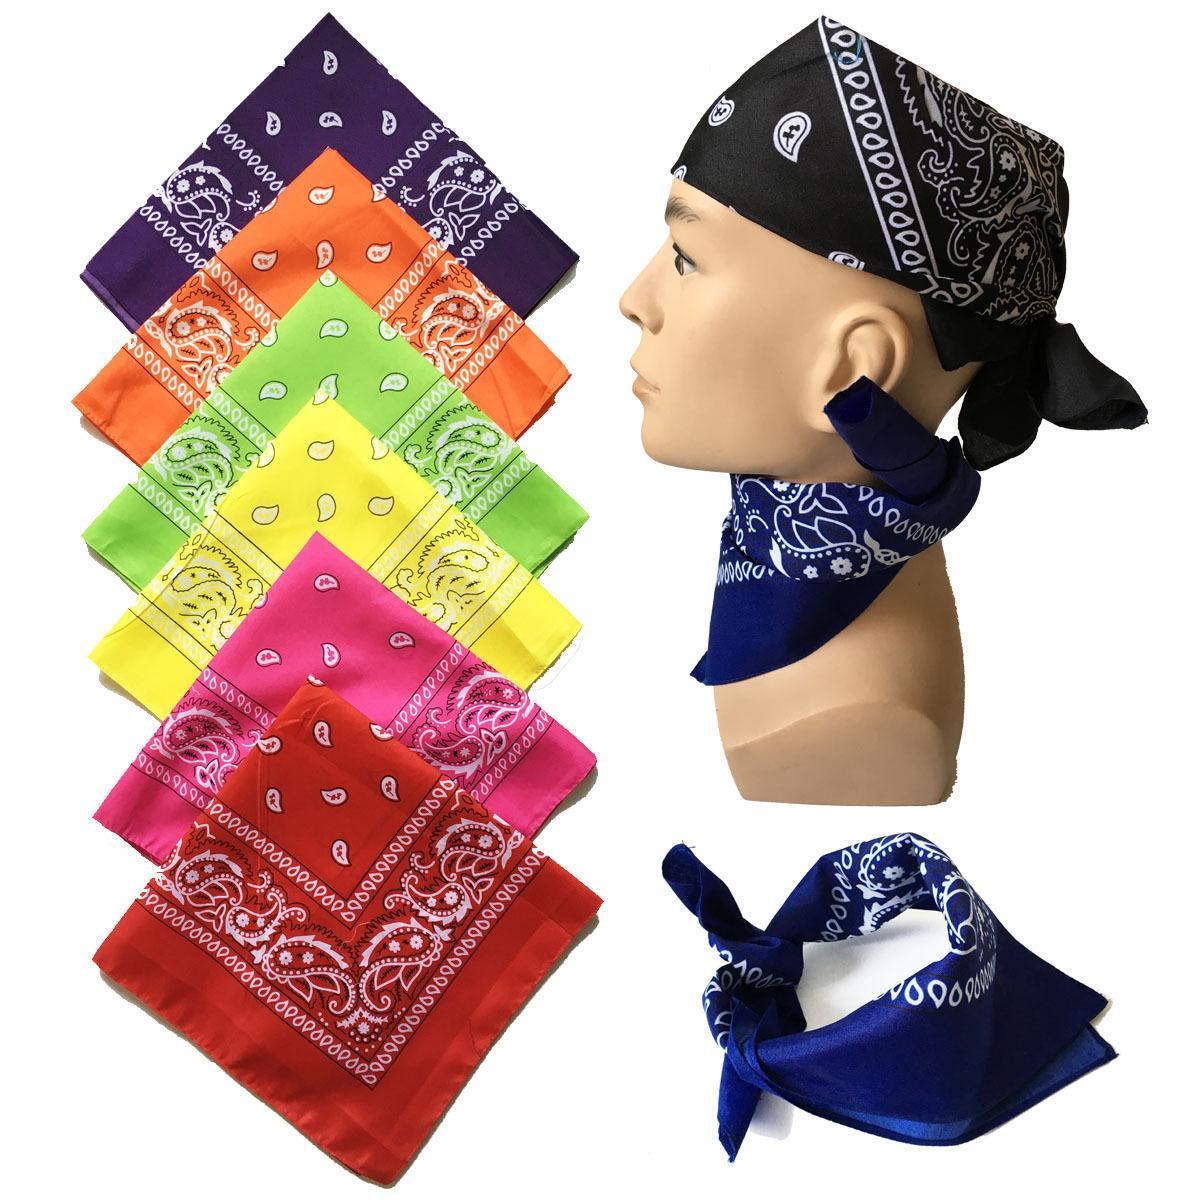 Spring Promotion for Boyfriend 100% cotton Paisley Cowboy Bandanas Hip hop Handkerchief Double sided Printed Square Multicolors Muffler